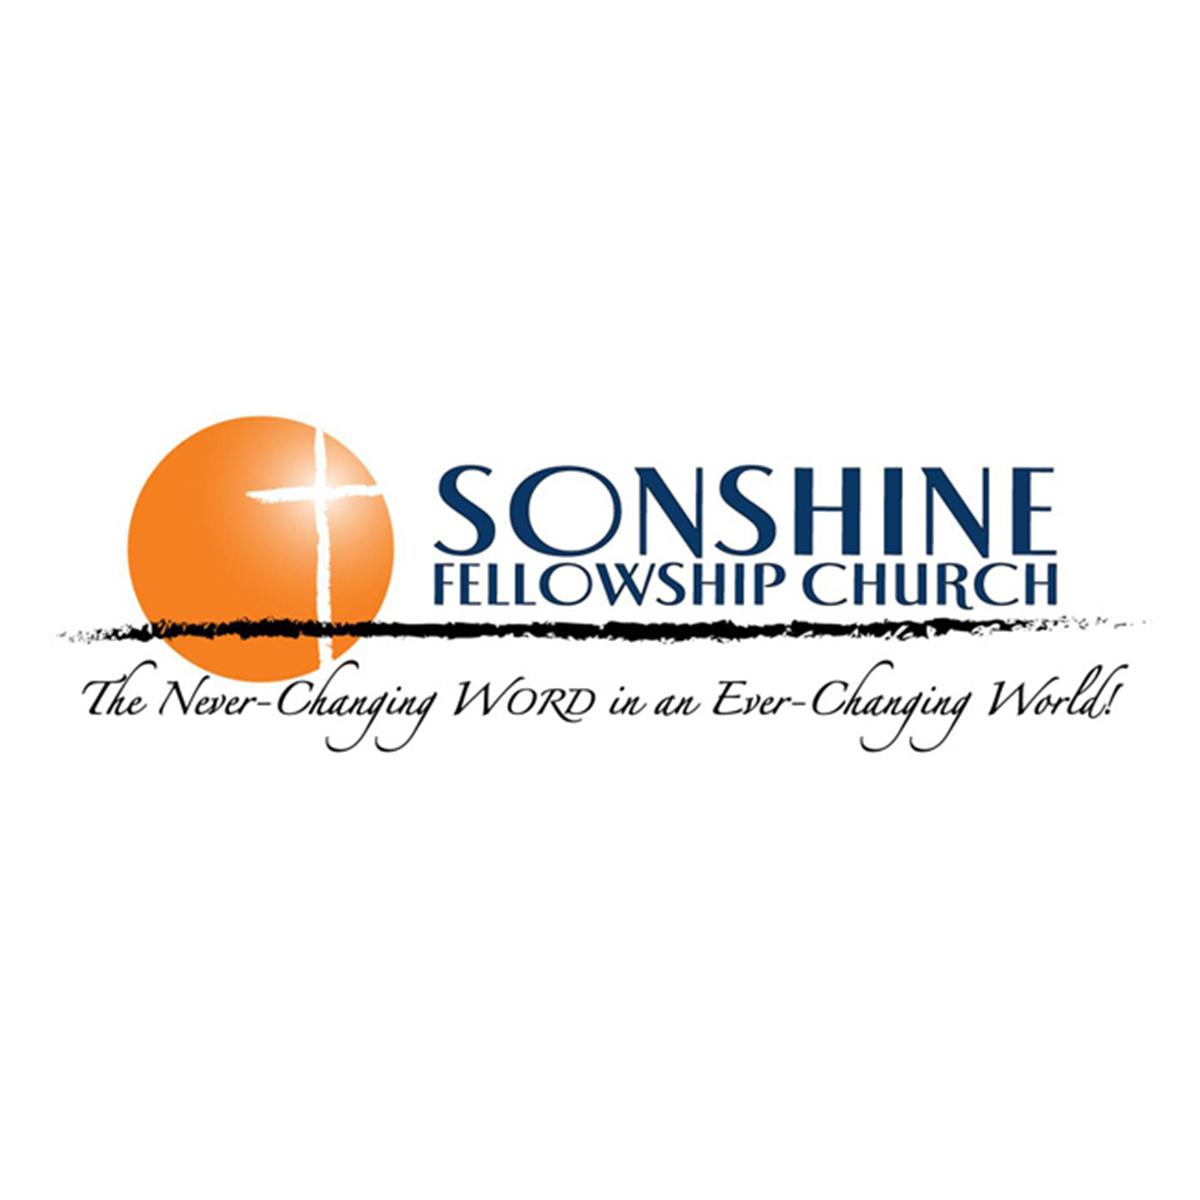 sonshinefellowship.jpg